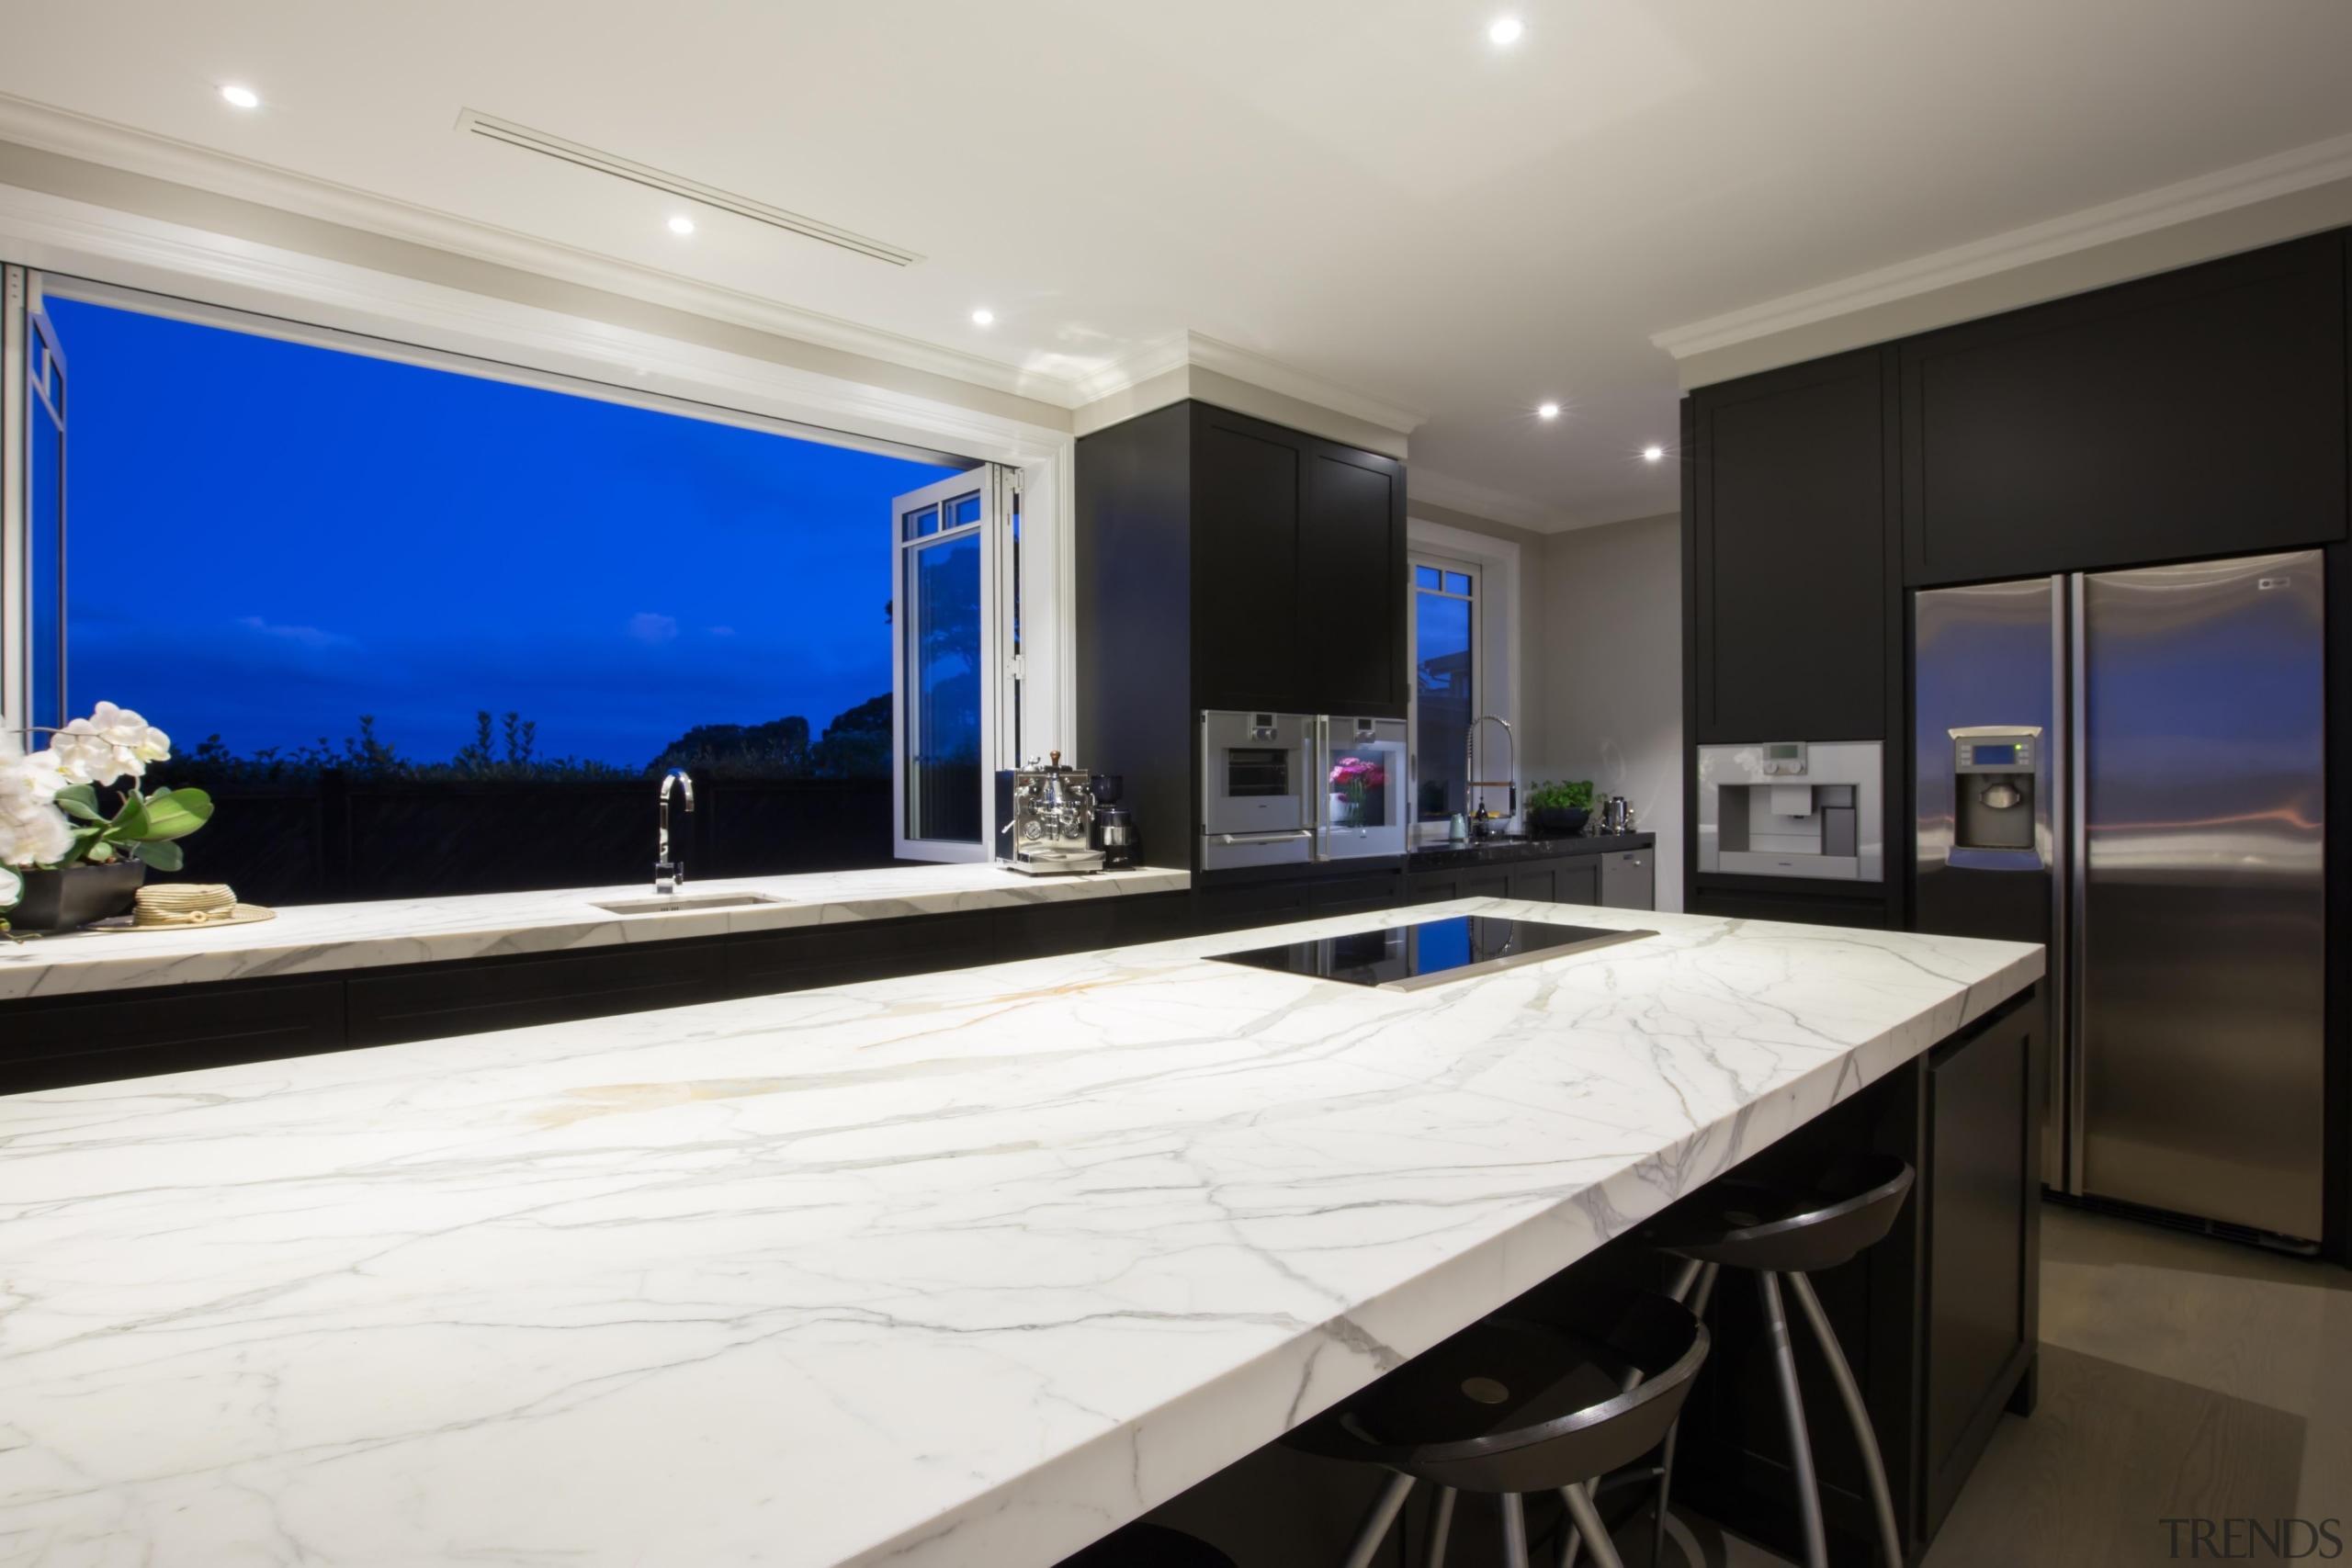 Img9018 - interior design   property   real interior design, property, real estate, white, black